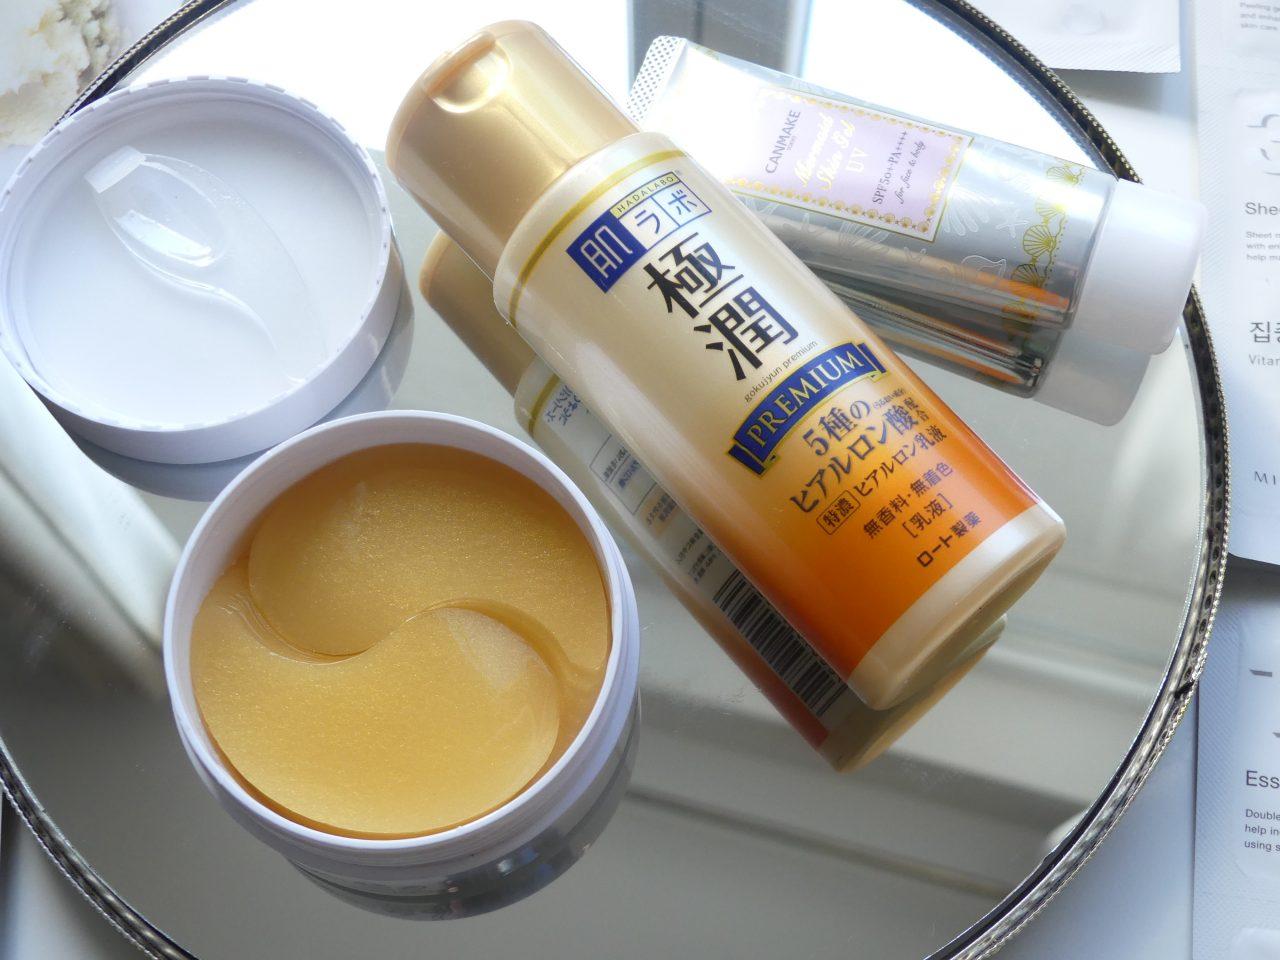 kórejska kozmetika